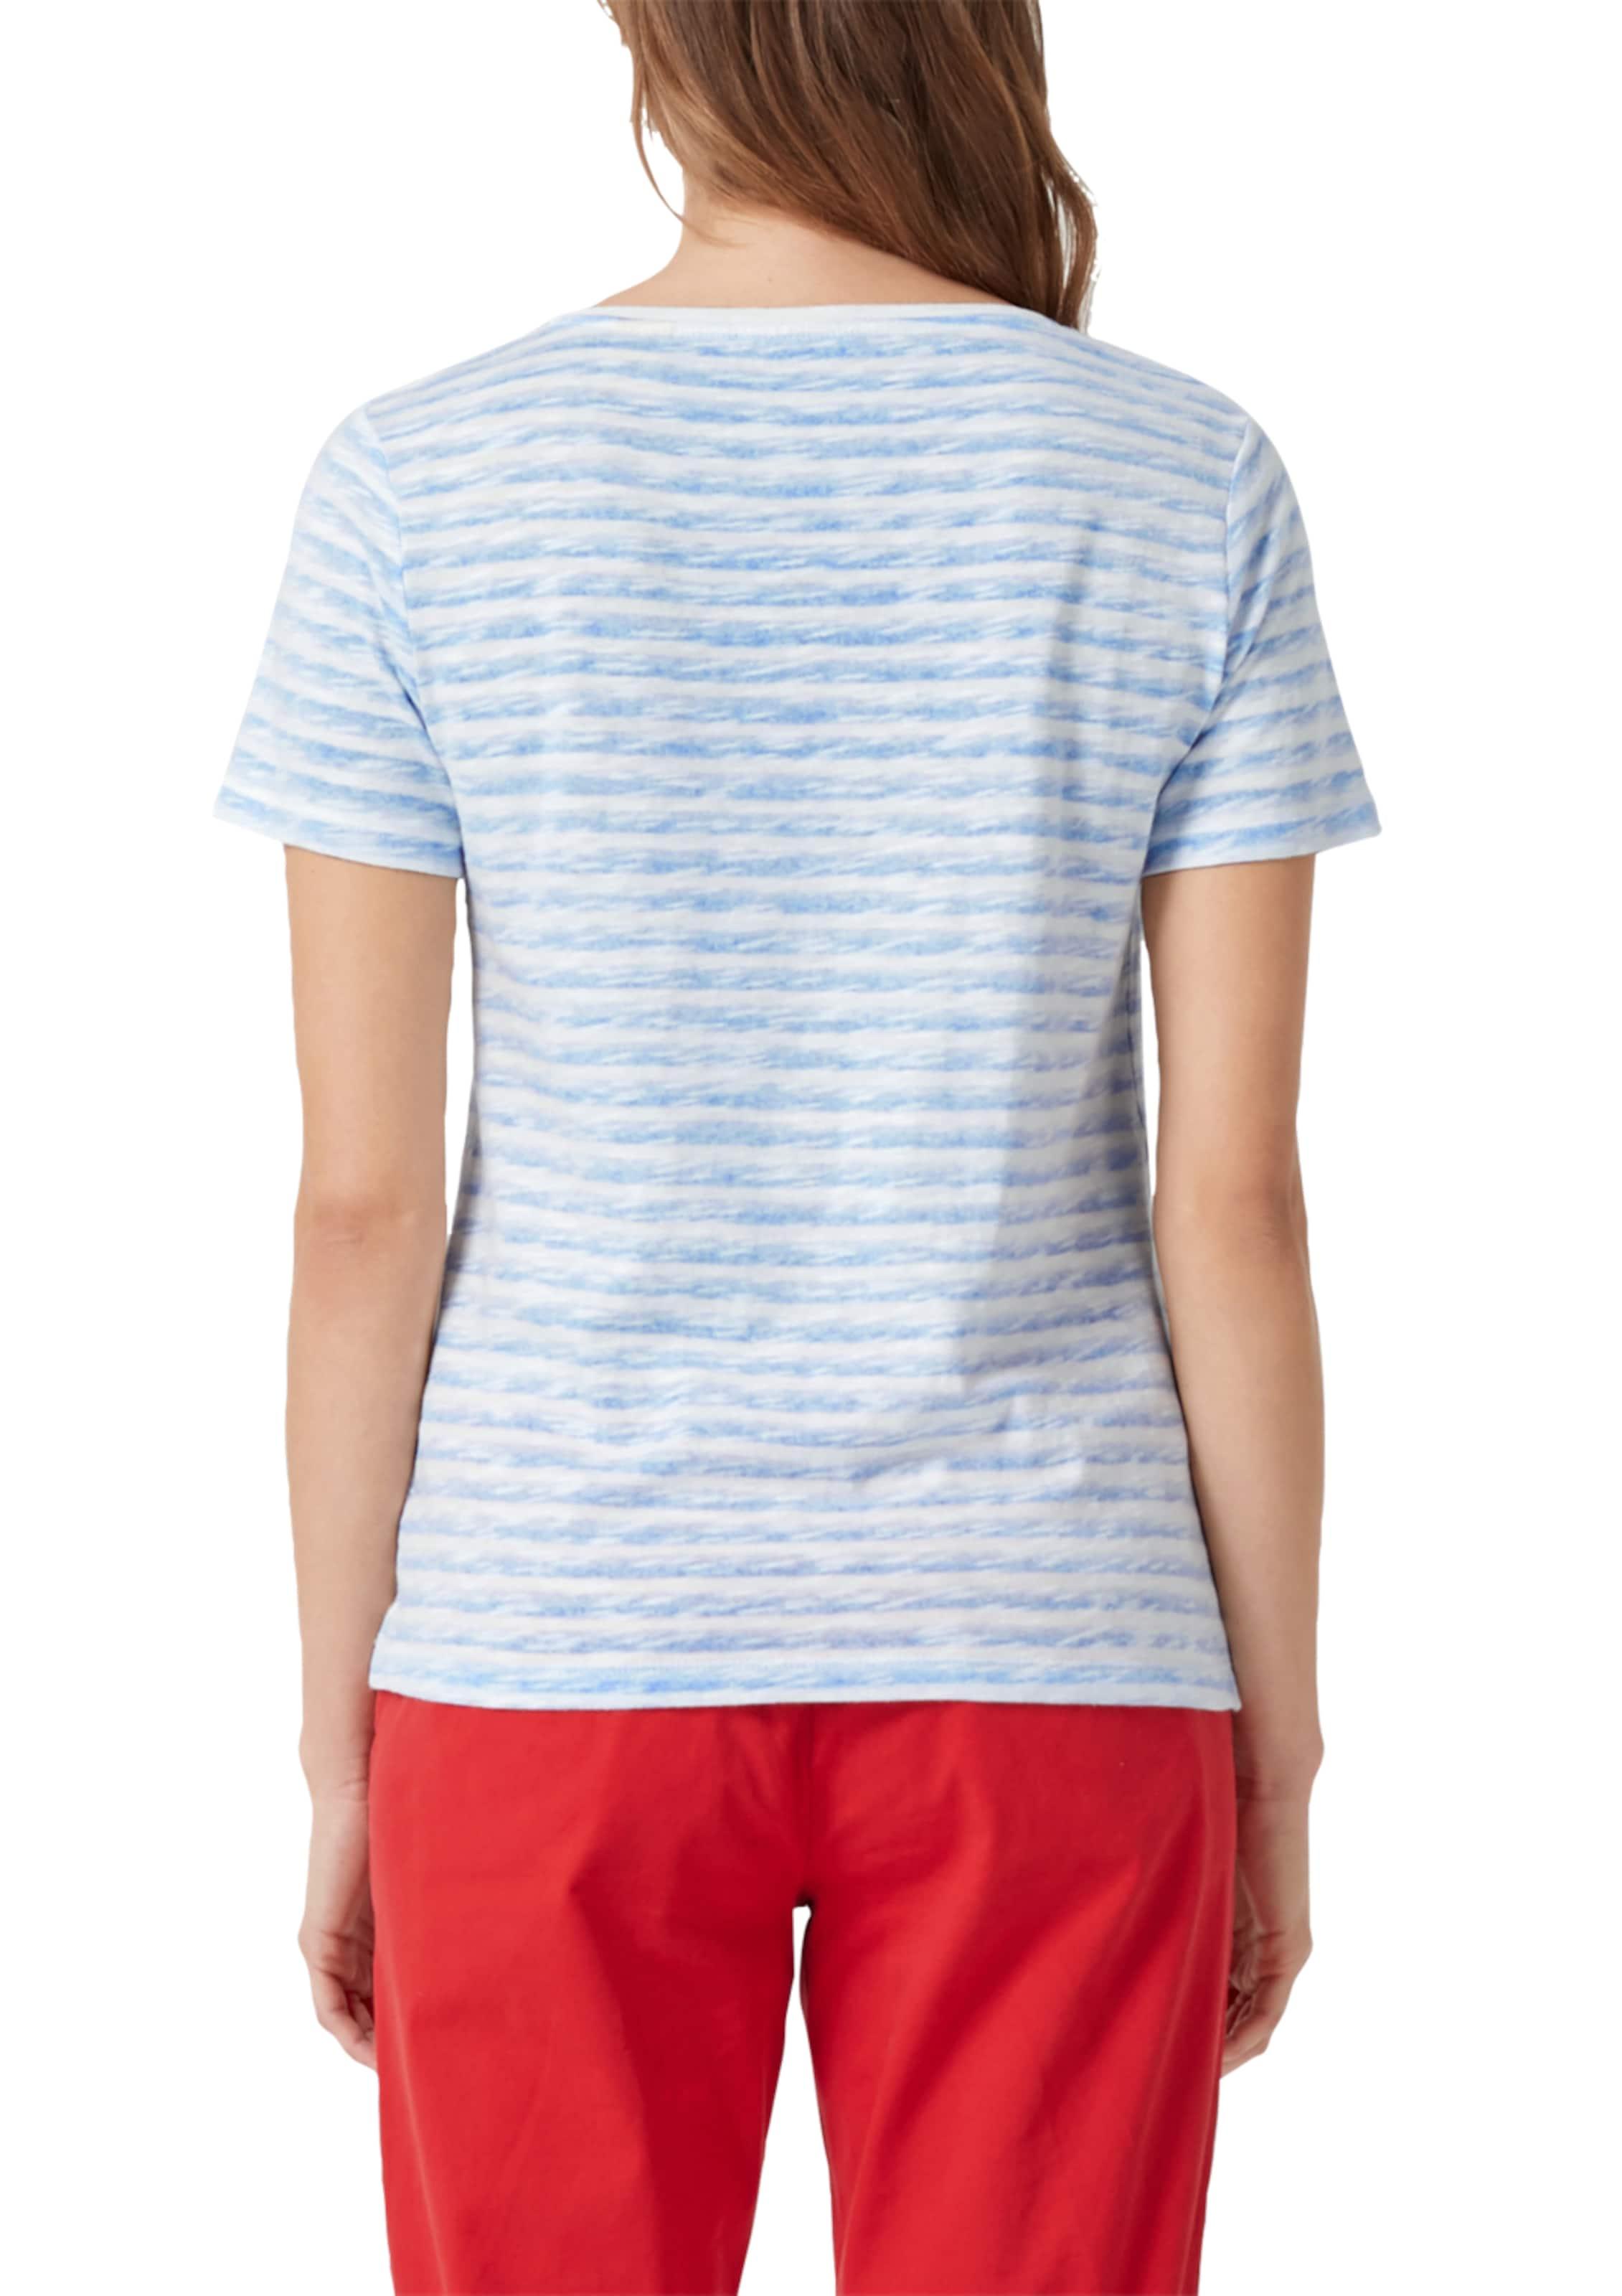 In S Red Label Shirt oliver RauchblauWeiß Y7ygvb6f